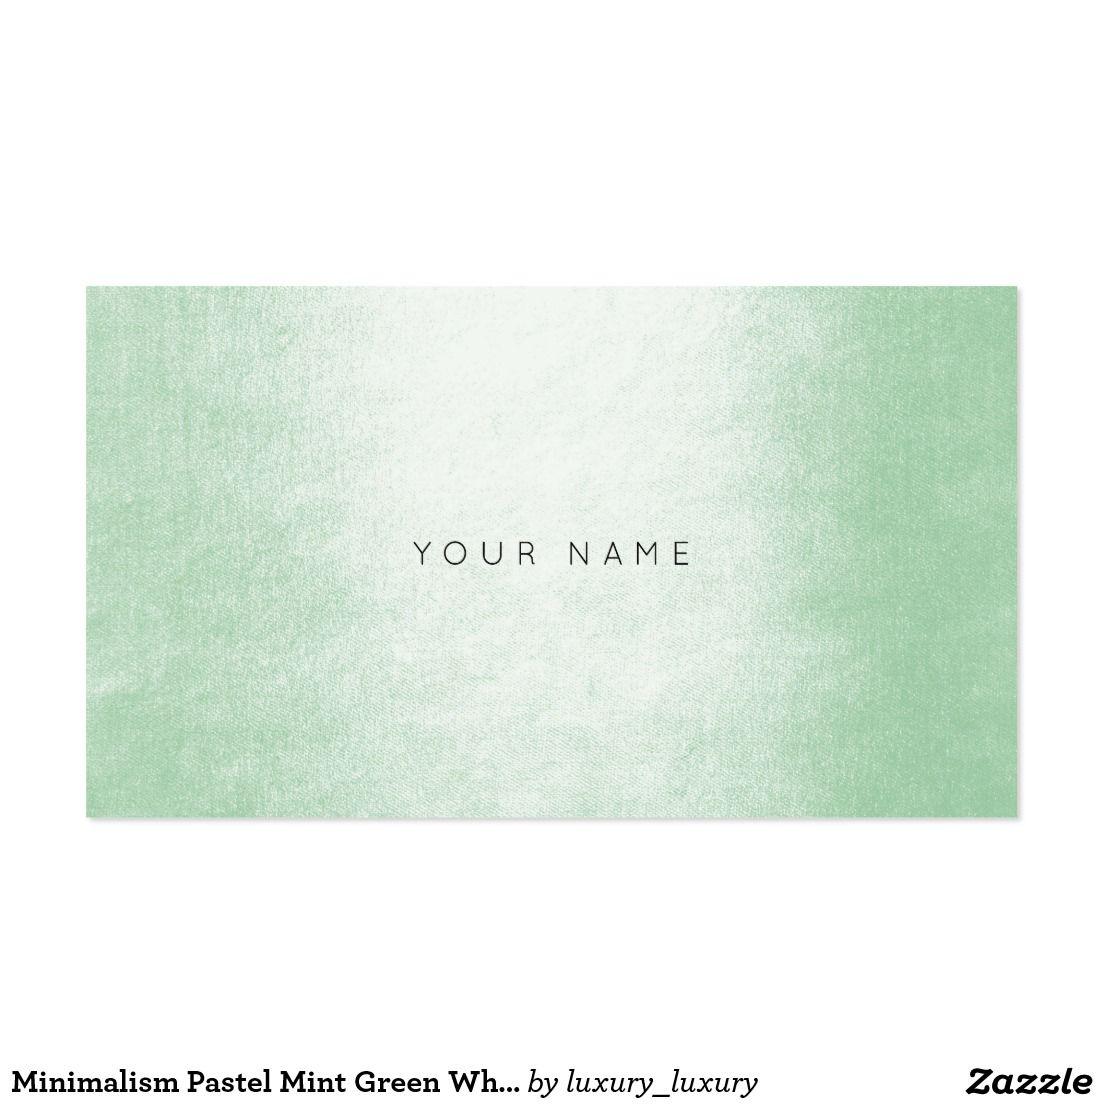 Minimalism pastel mint green white vip pack of standard business minimalism pastel mint green white vip pack of standard business cards reheart Choice Image